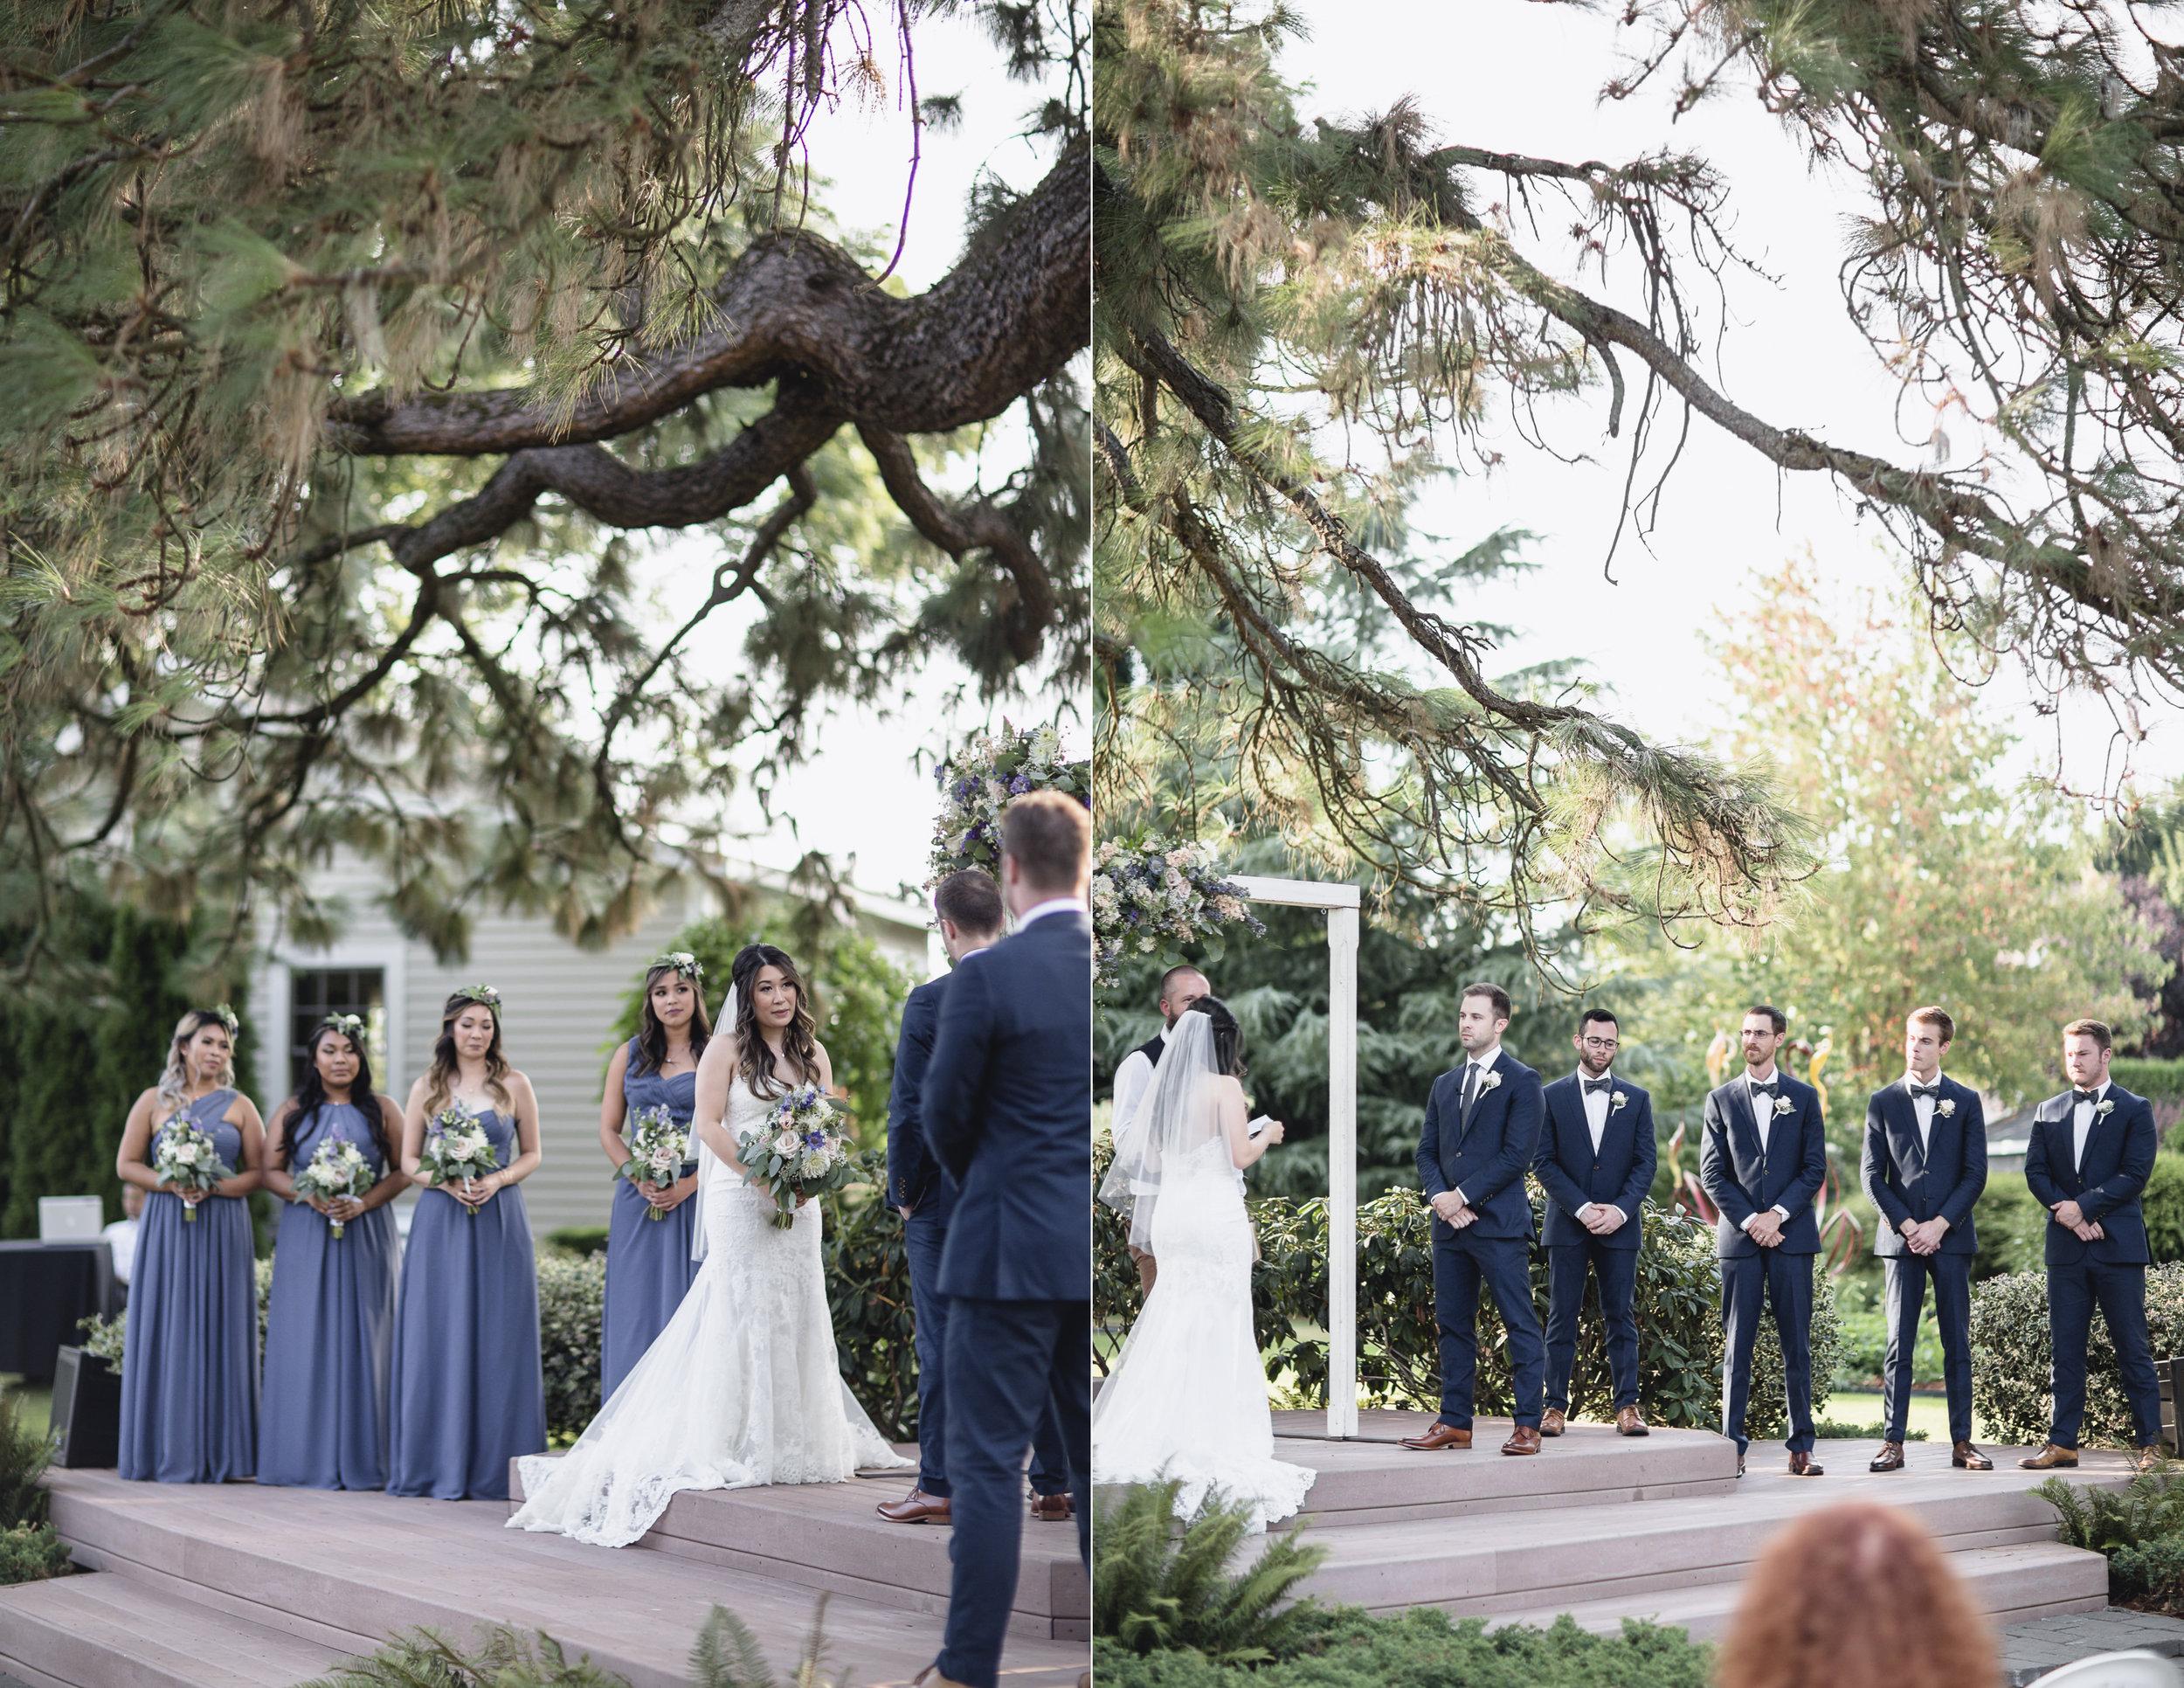 Ainsworth house wedding venue oregon city portland oregon photographer maccoy dean fine art 12.jpg